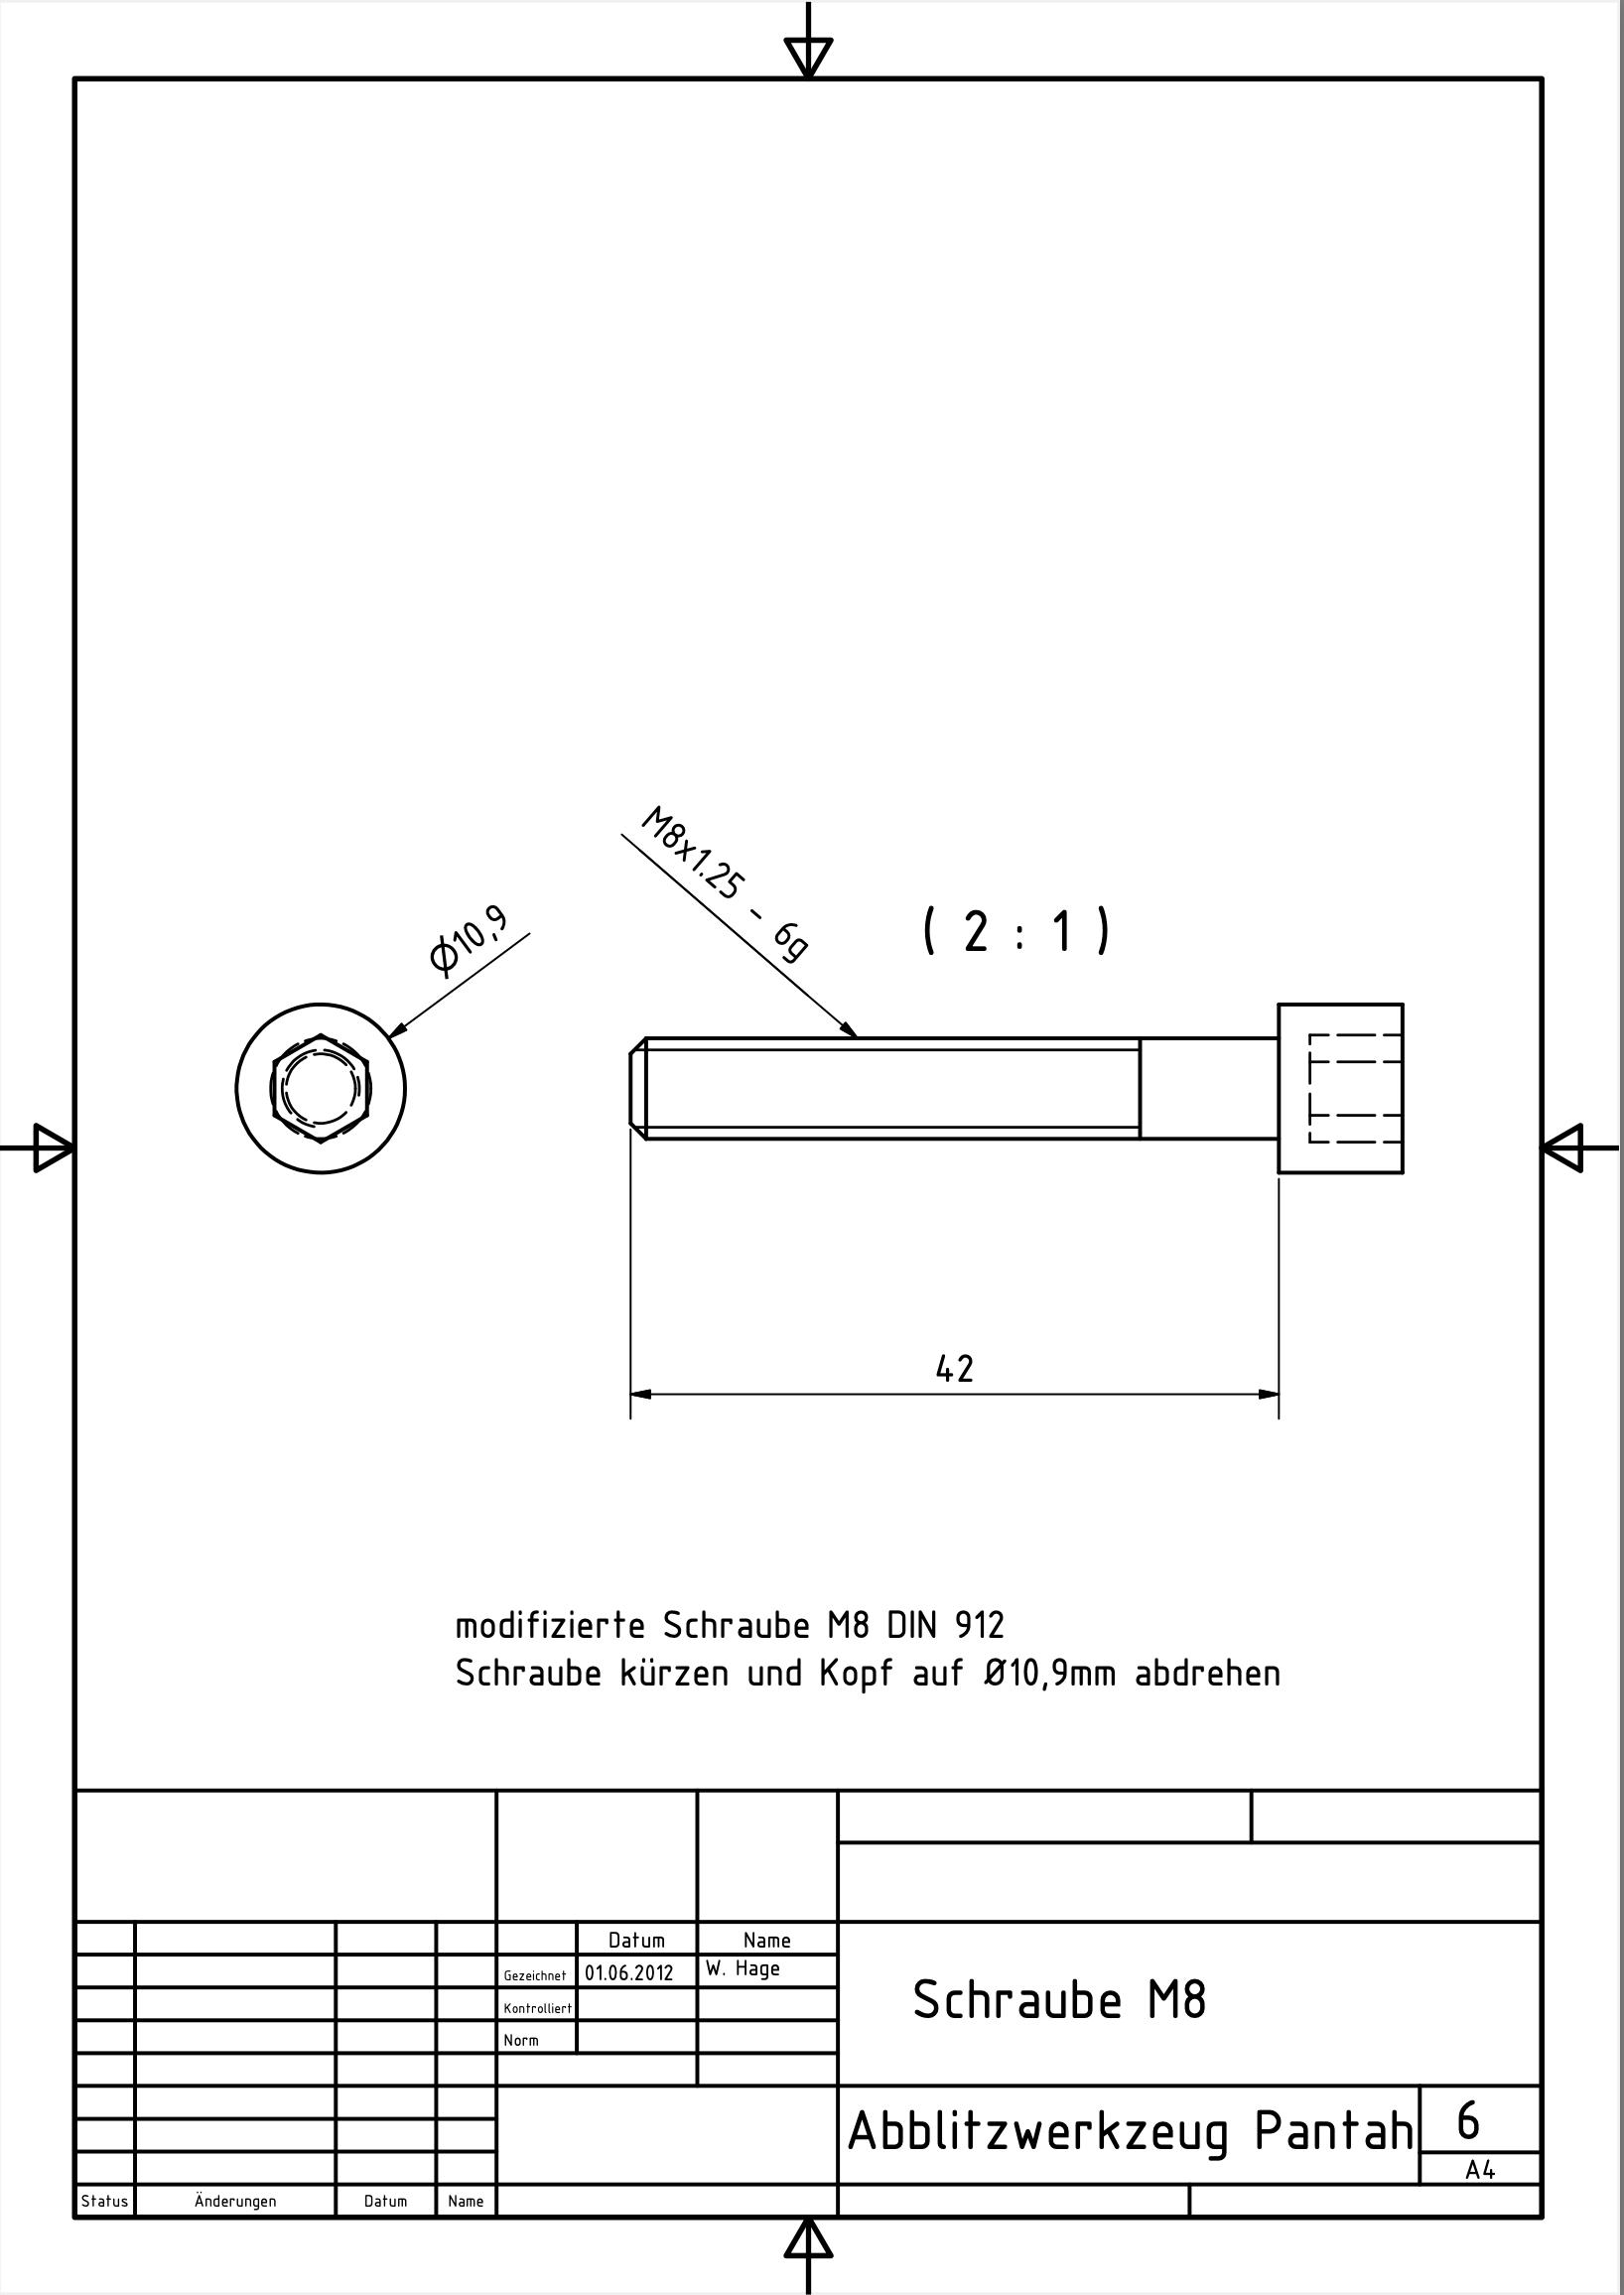 Abblitzwerkzeug Pantah 6